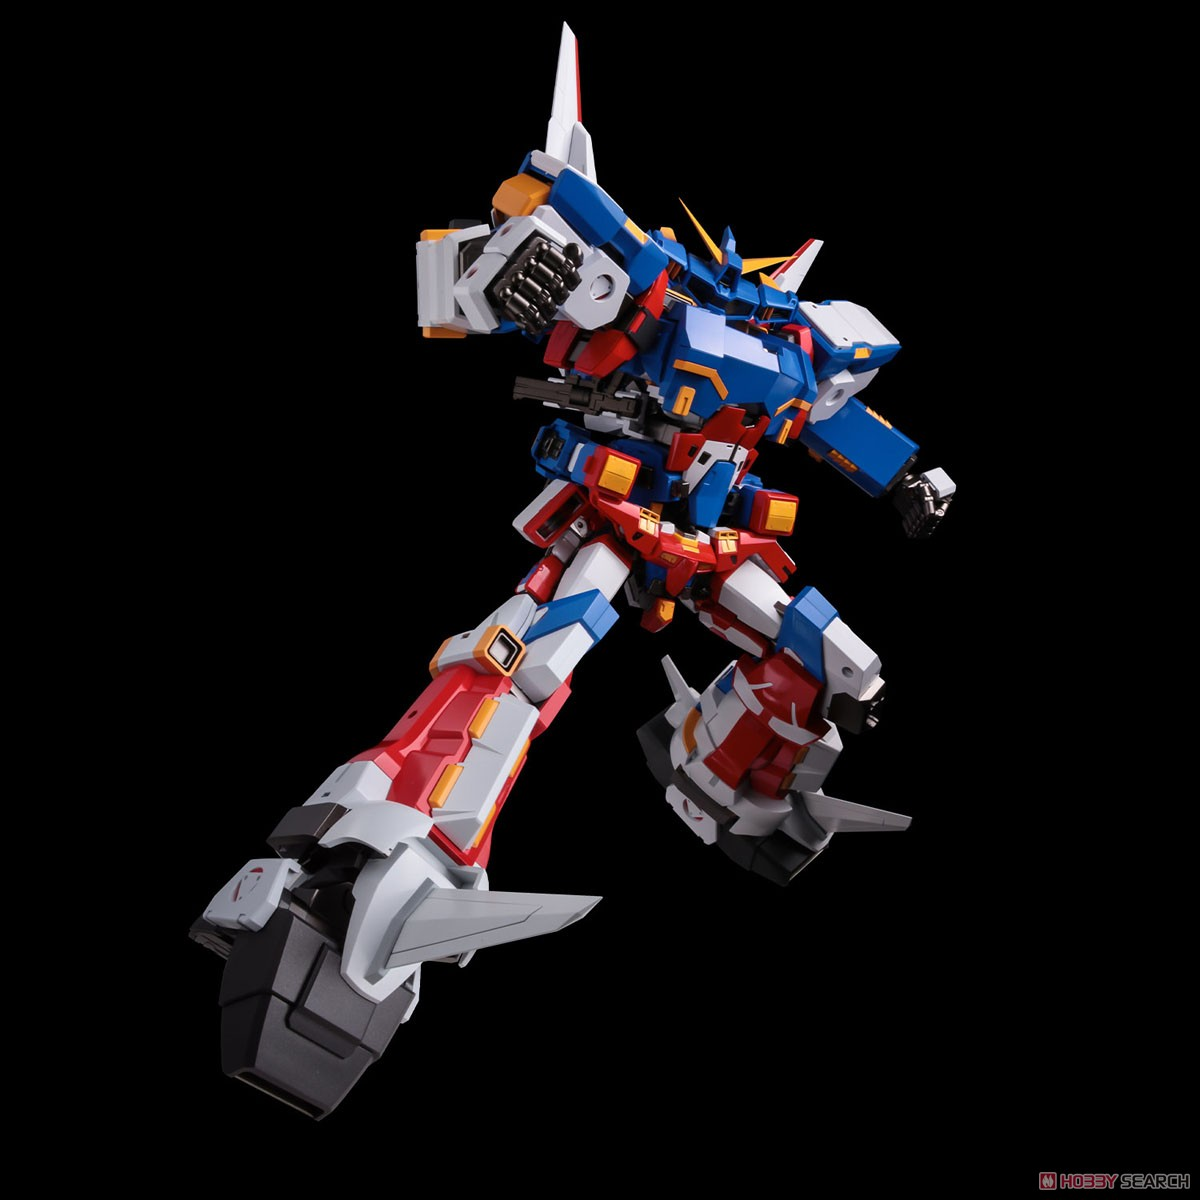 RIOBOT『変形合体 R-1』スーパーロボット大戦OG 可変合体フィギュア-047